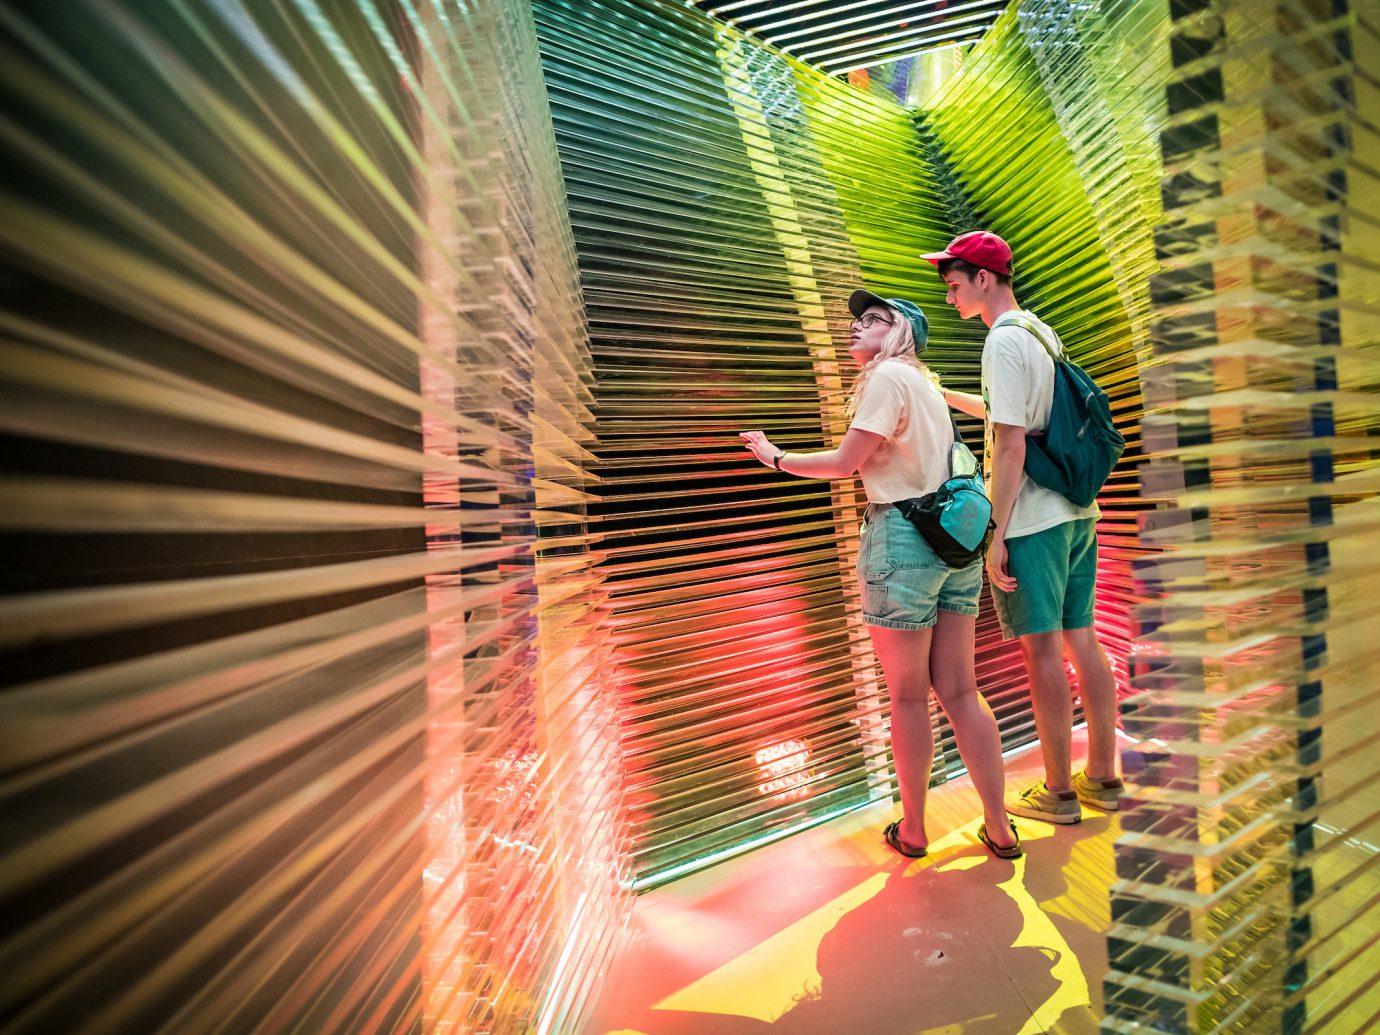 art Arts + Culture concert music festival music venue summer color light snapshot interior design accordion